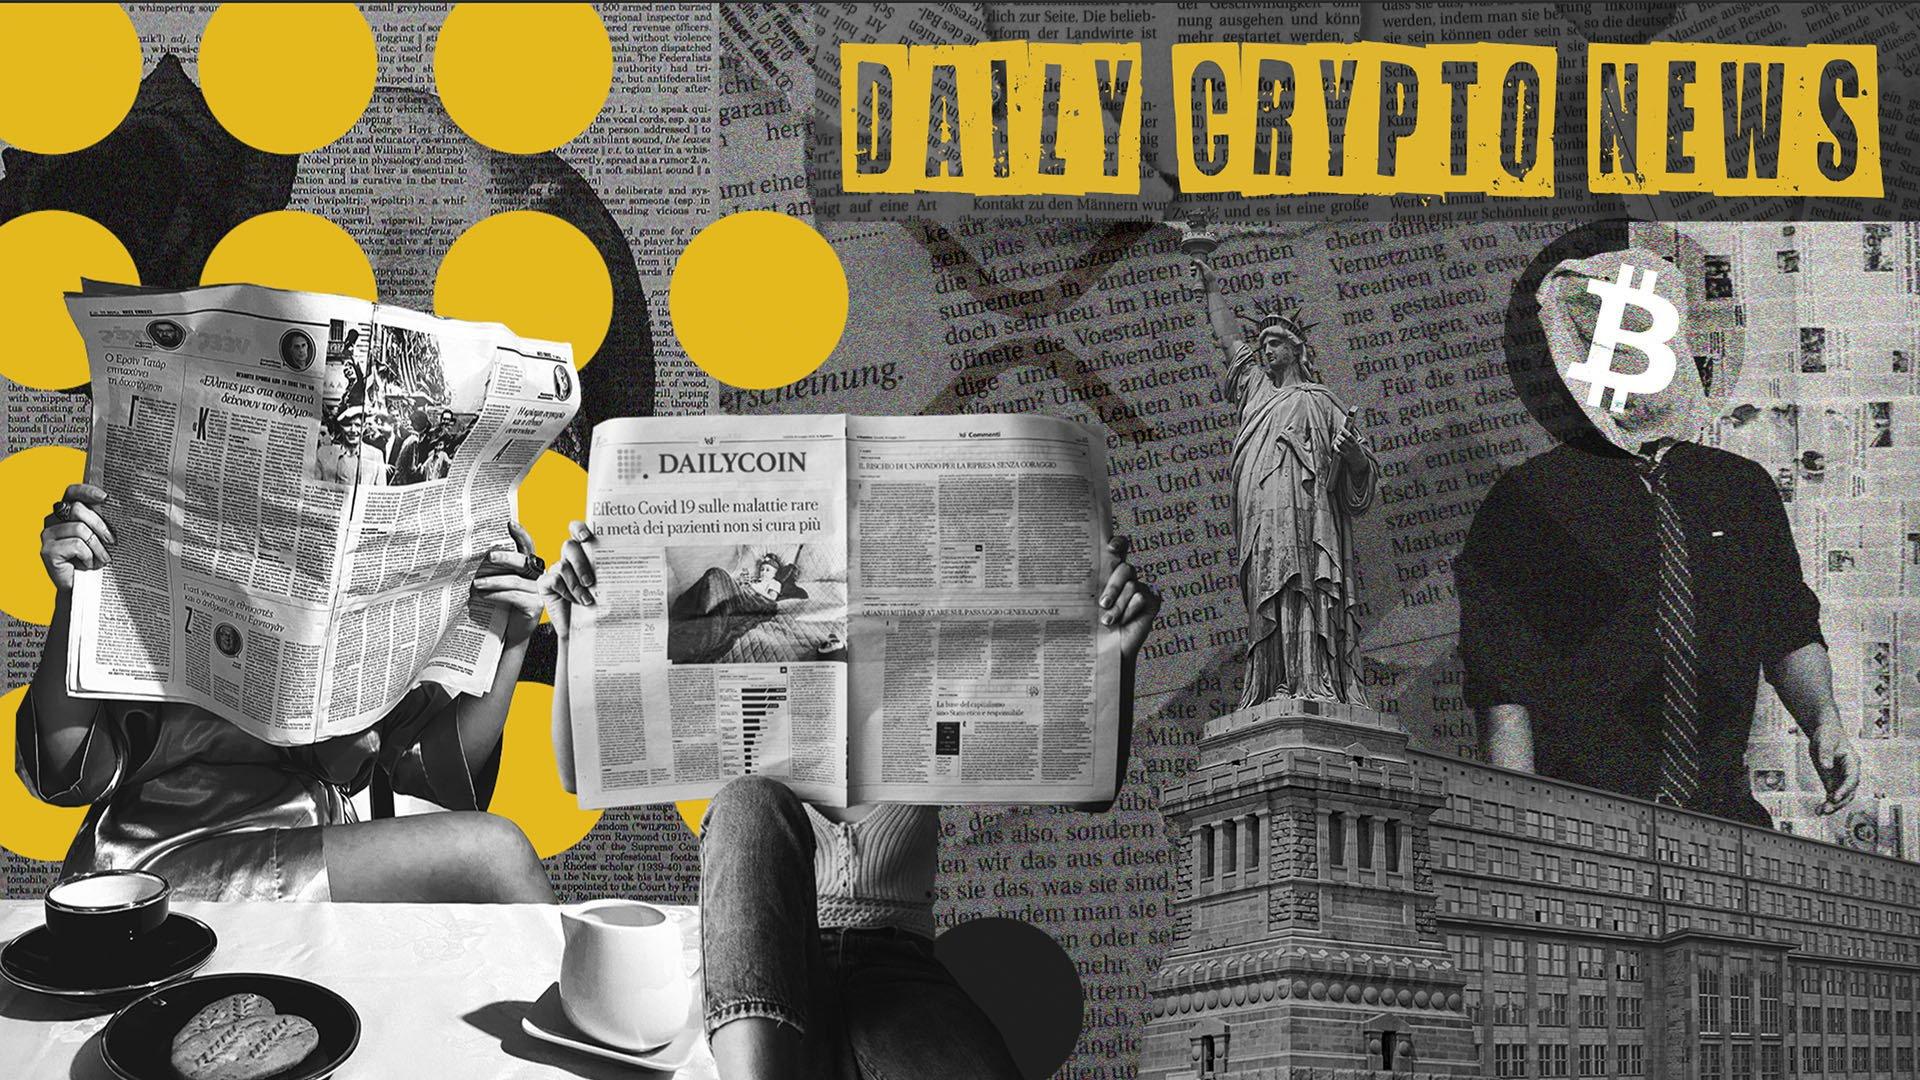 Crypto Flipsider News – May 6th – Mike Novogratz, BitGo, Bitcoin Cash, Telcoin, Bahamas Sand Dollar, India, Argentina — DailyCoin